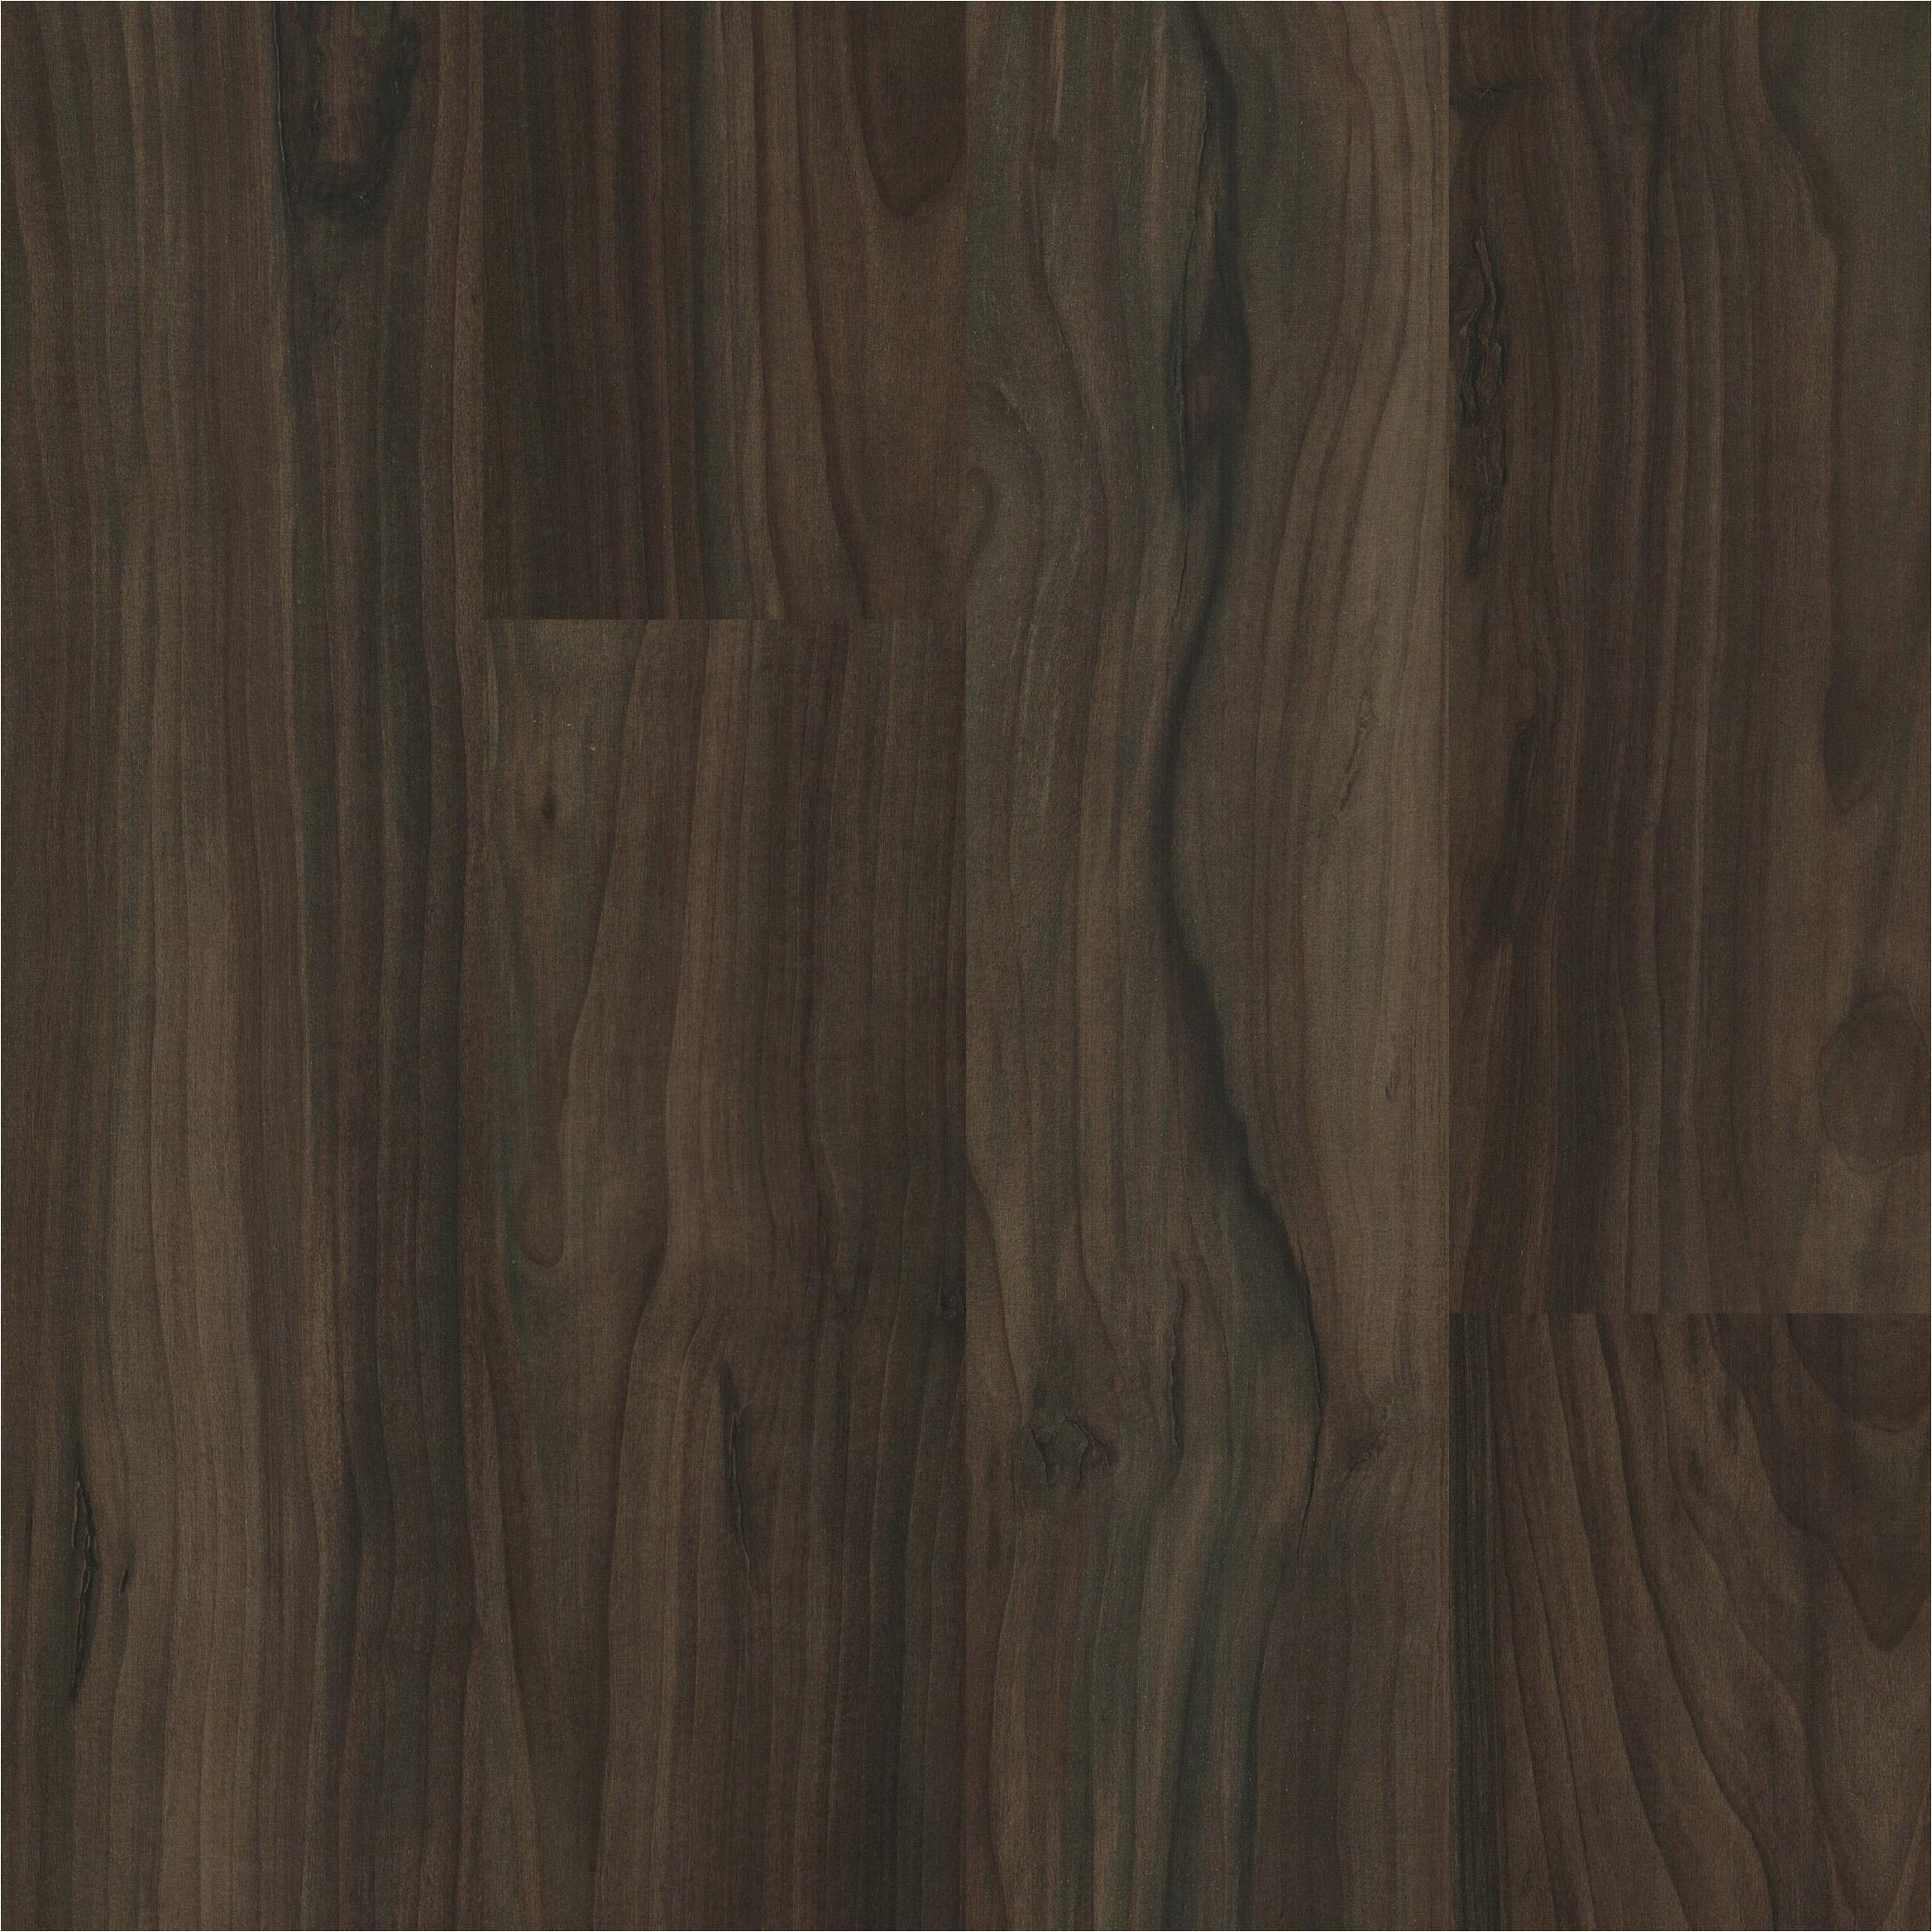 Is Vinyl Plank Flooring Really Waterproof Ivc Moduleo Vision Harmony Maple 6 Waterproof Click together Lvt